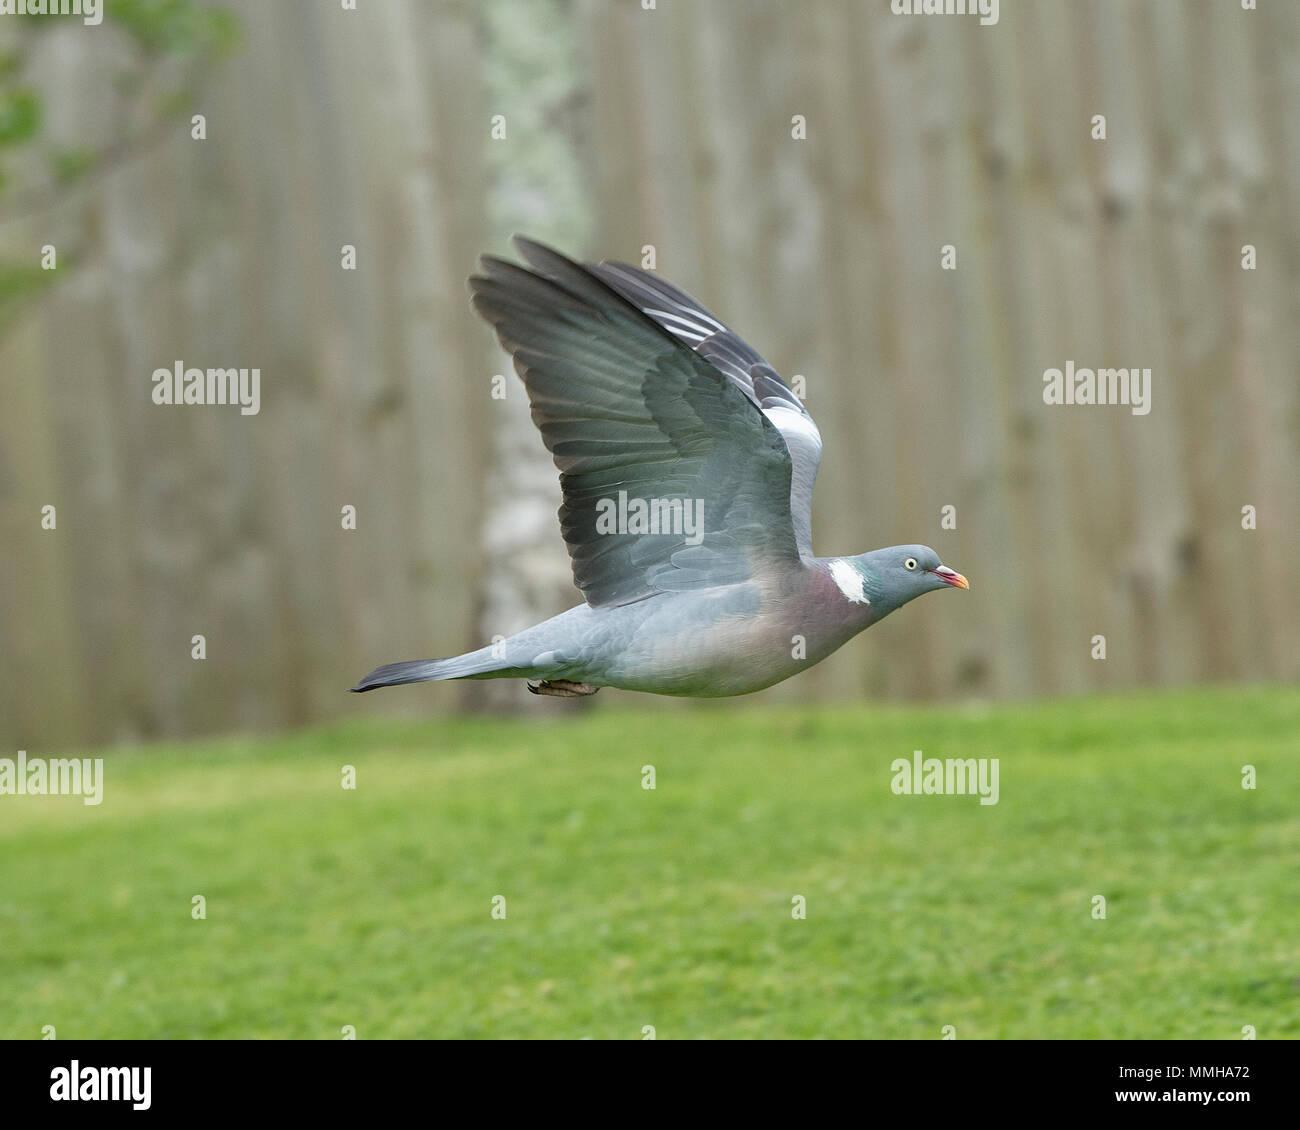 wood pigeon in flight - Stock Image